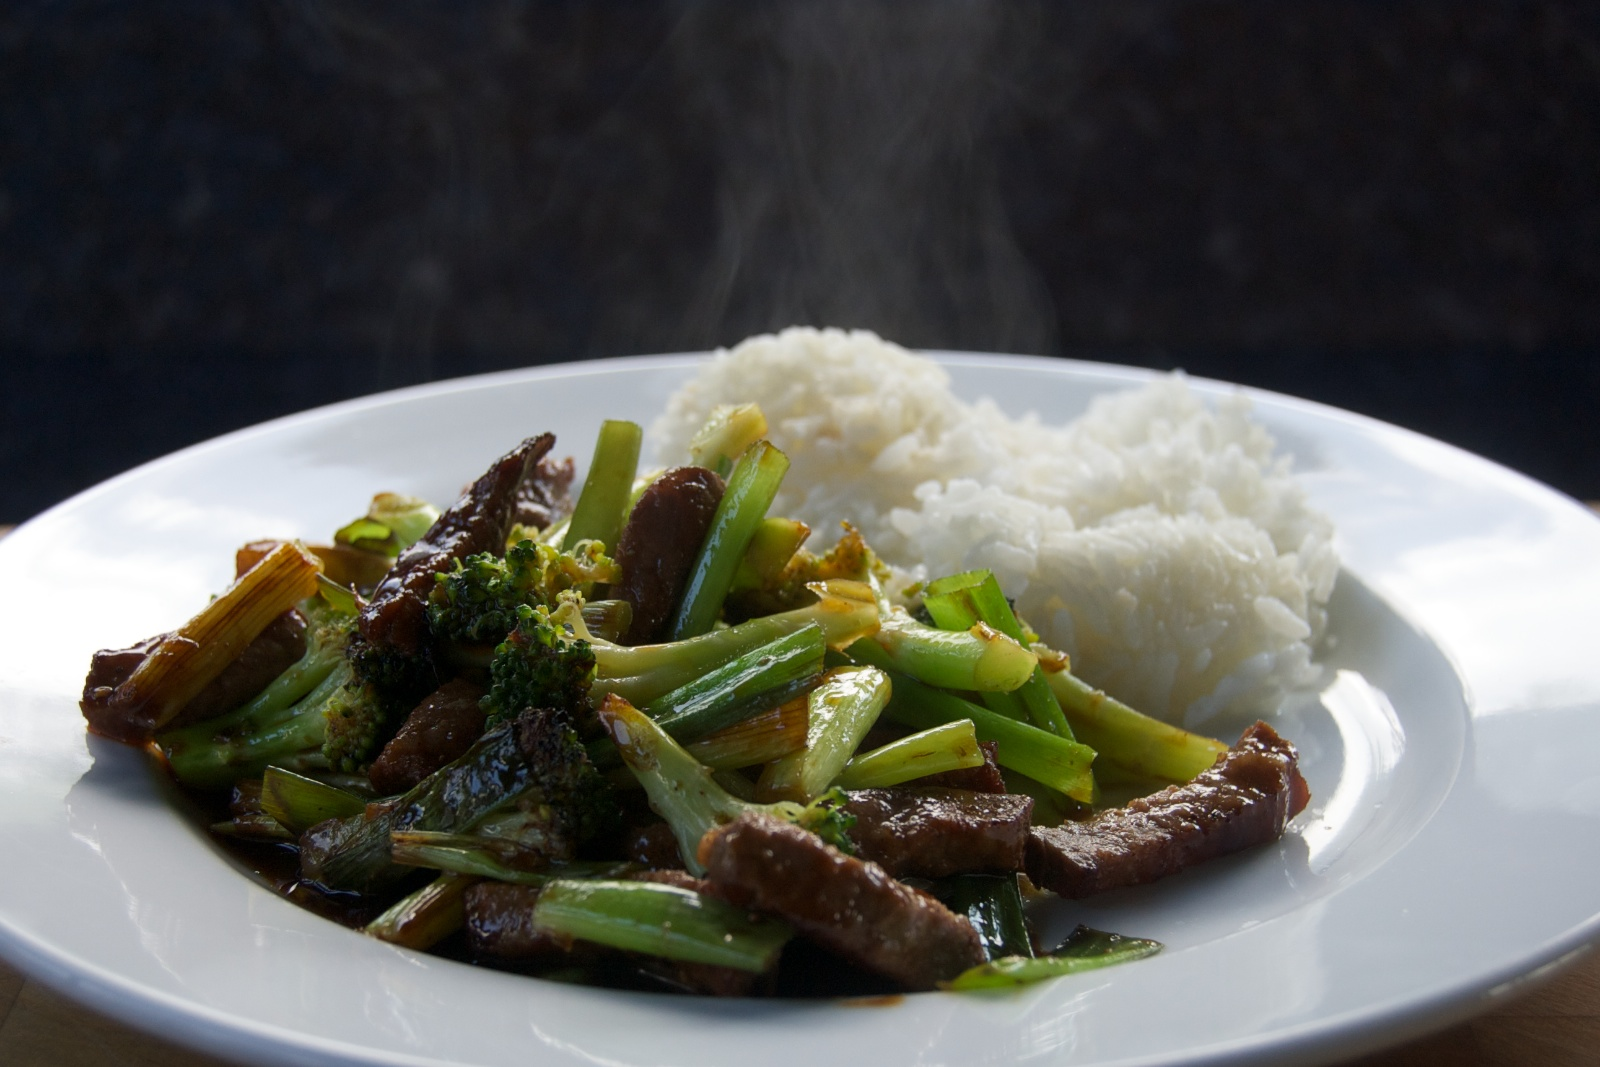 http://blog.rickk.com/food/2014/09/01/ate.2014.09.01.l.jpg